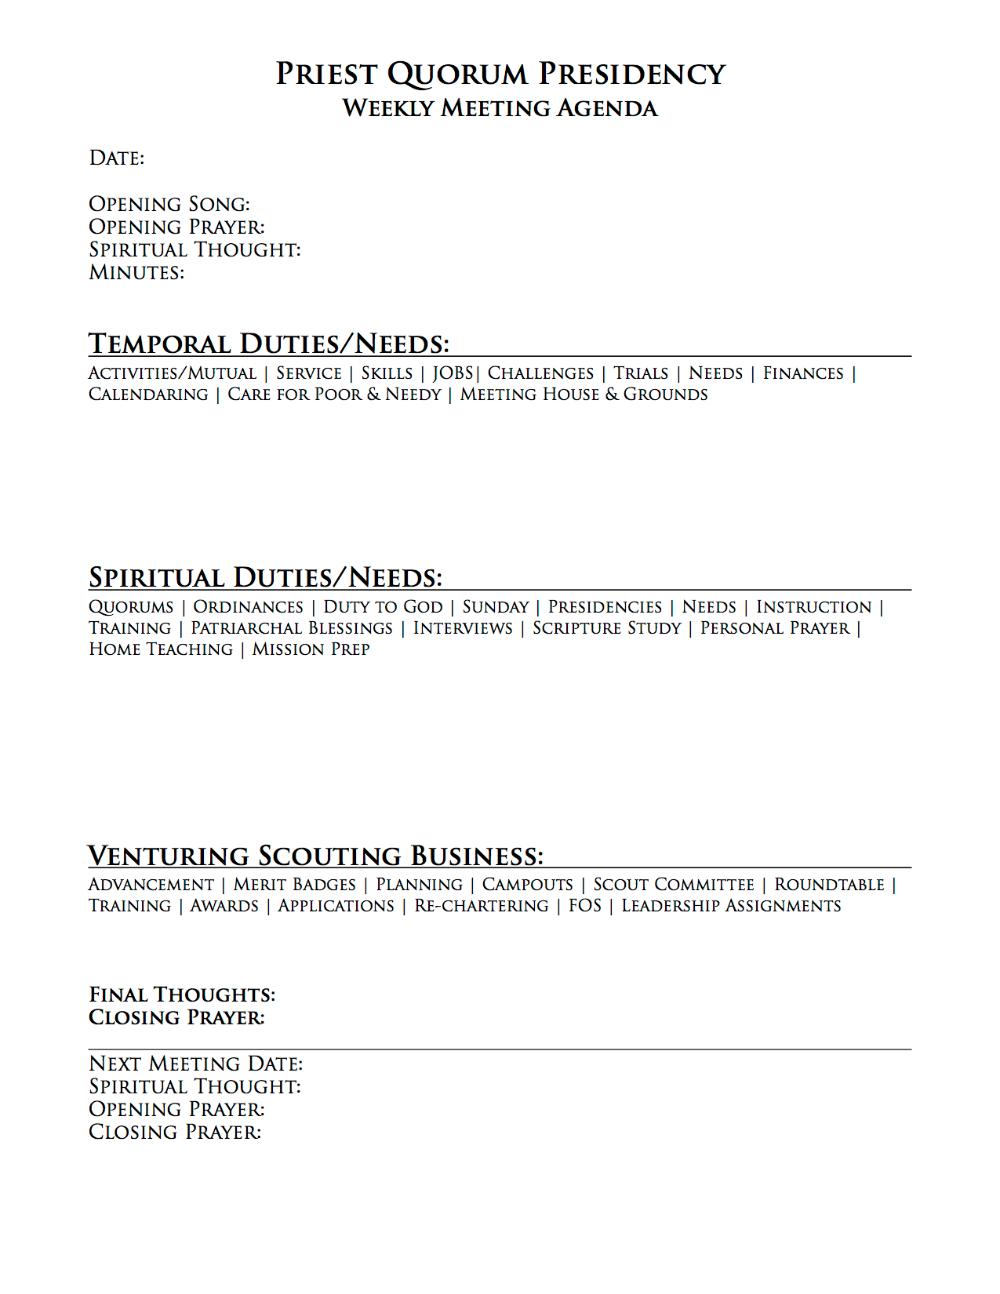 Amazing Teacher Meeting Agenda Template Collection - Resume Ideas ...